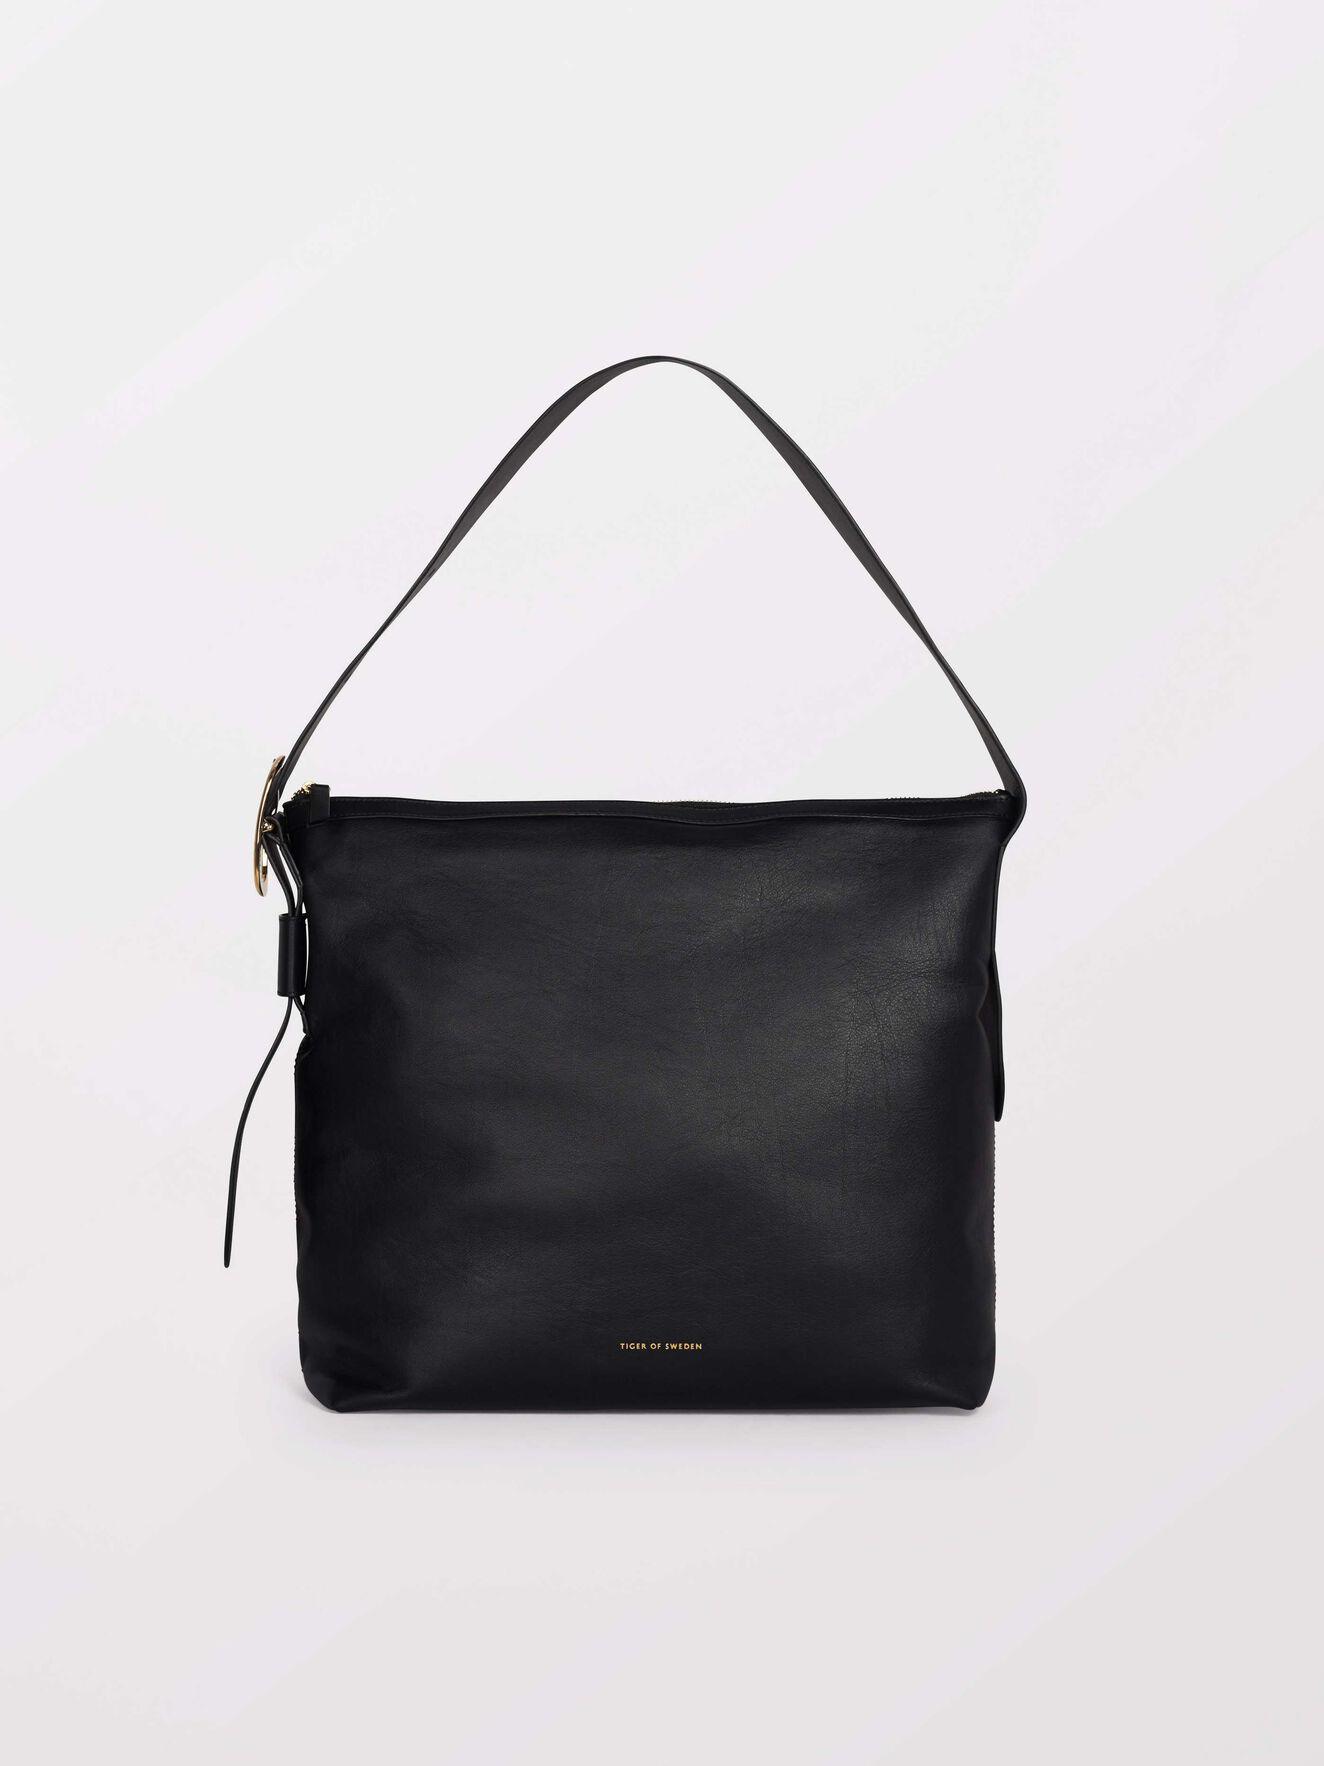 Bamosa Bag in Black from Tiger of Sweden